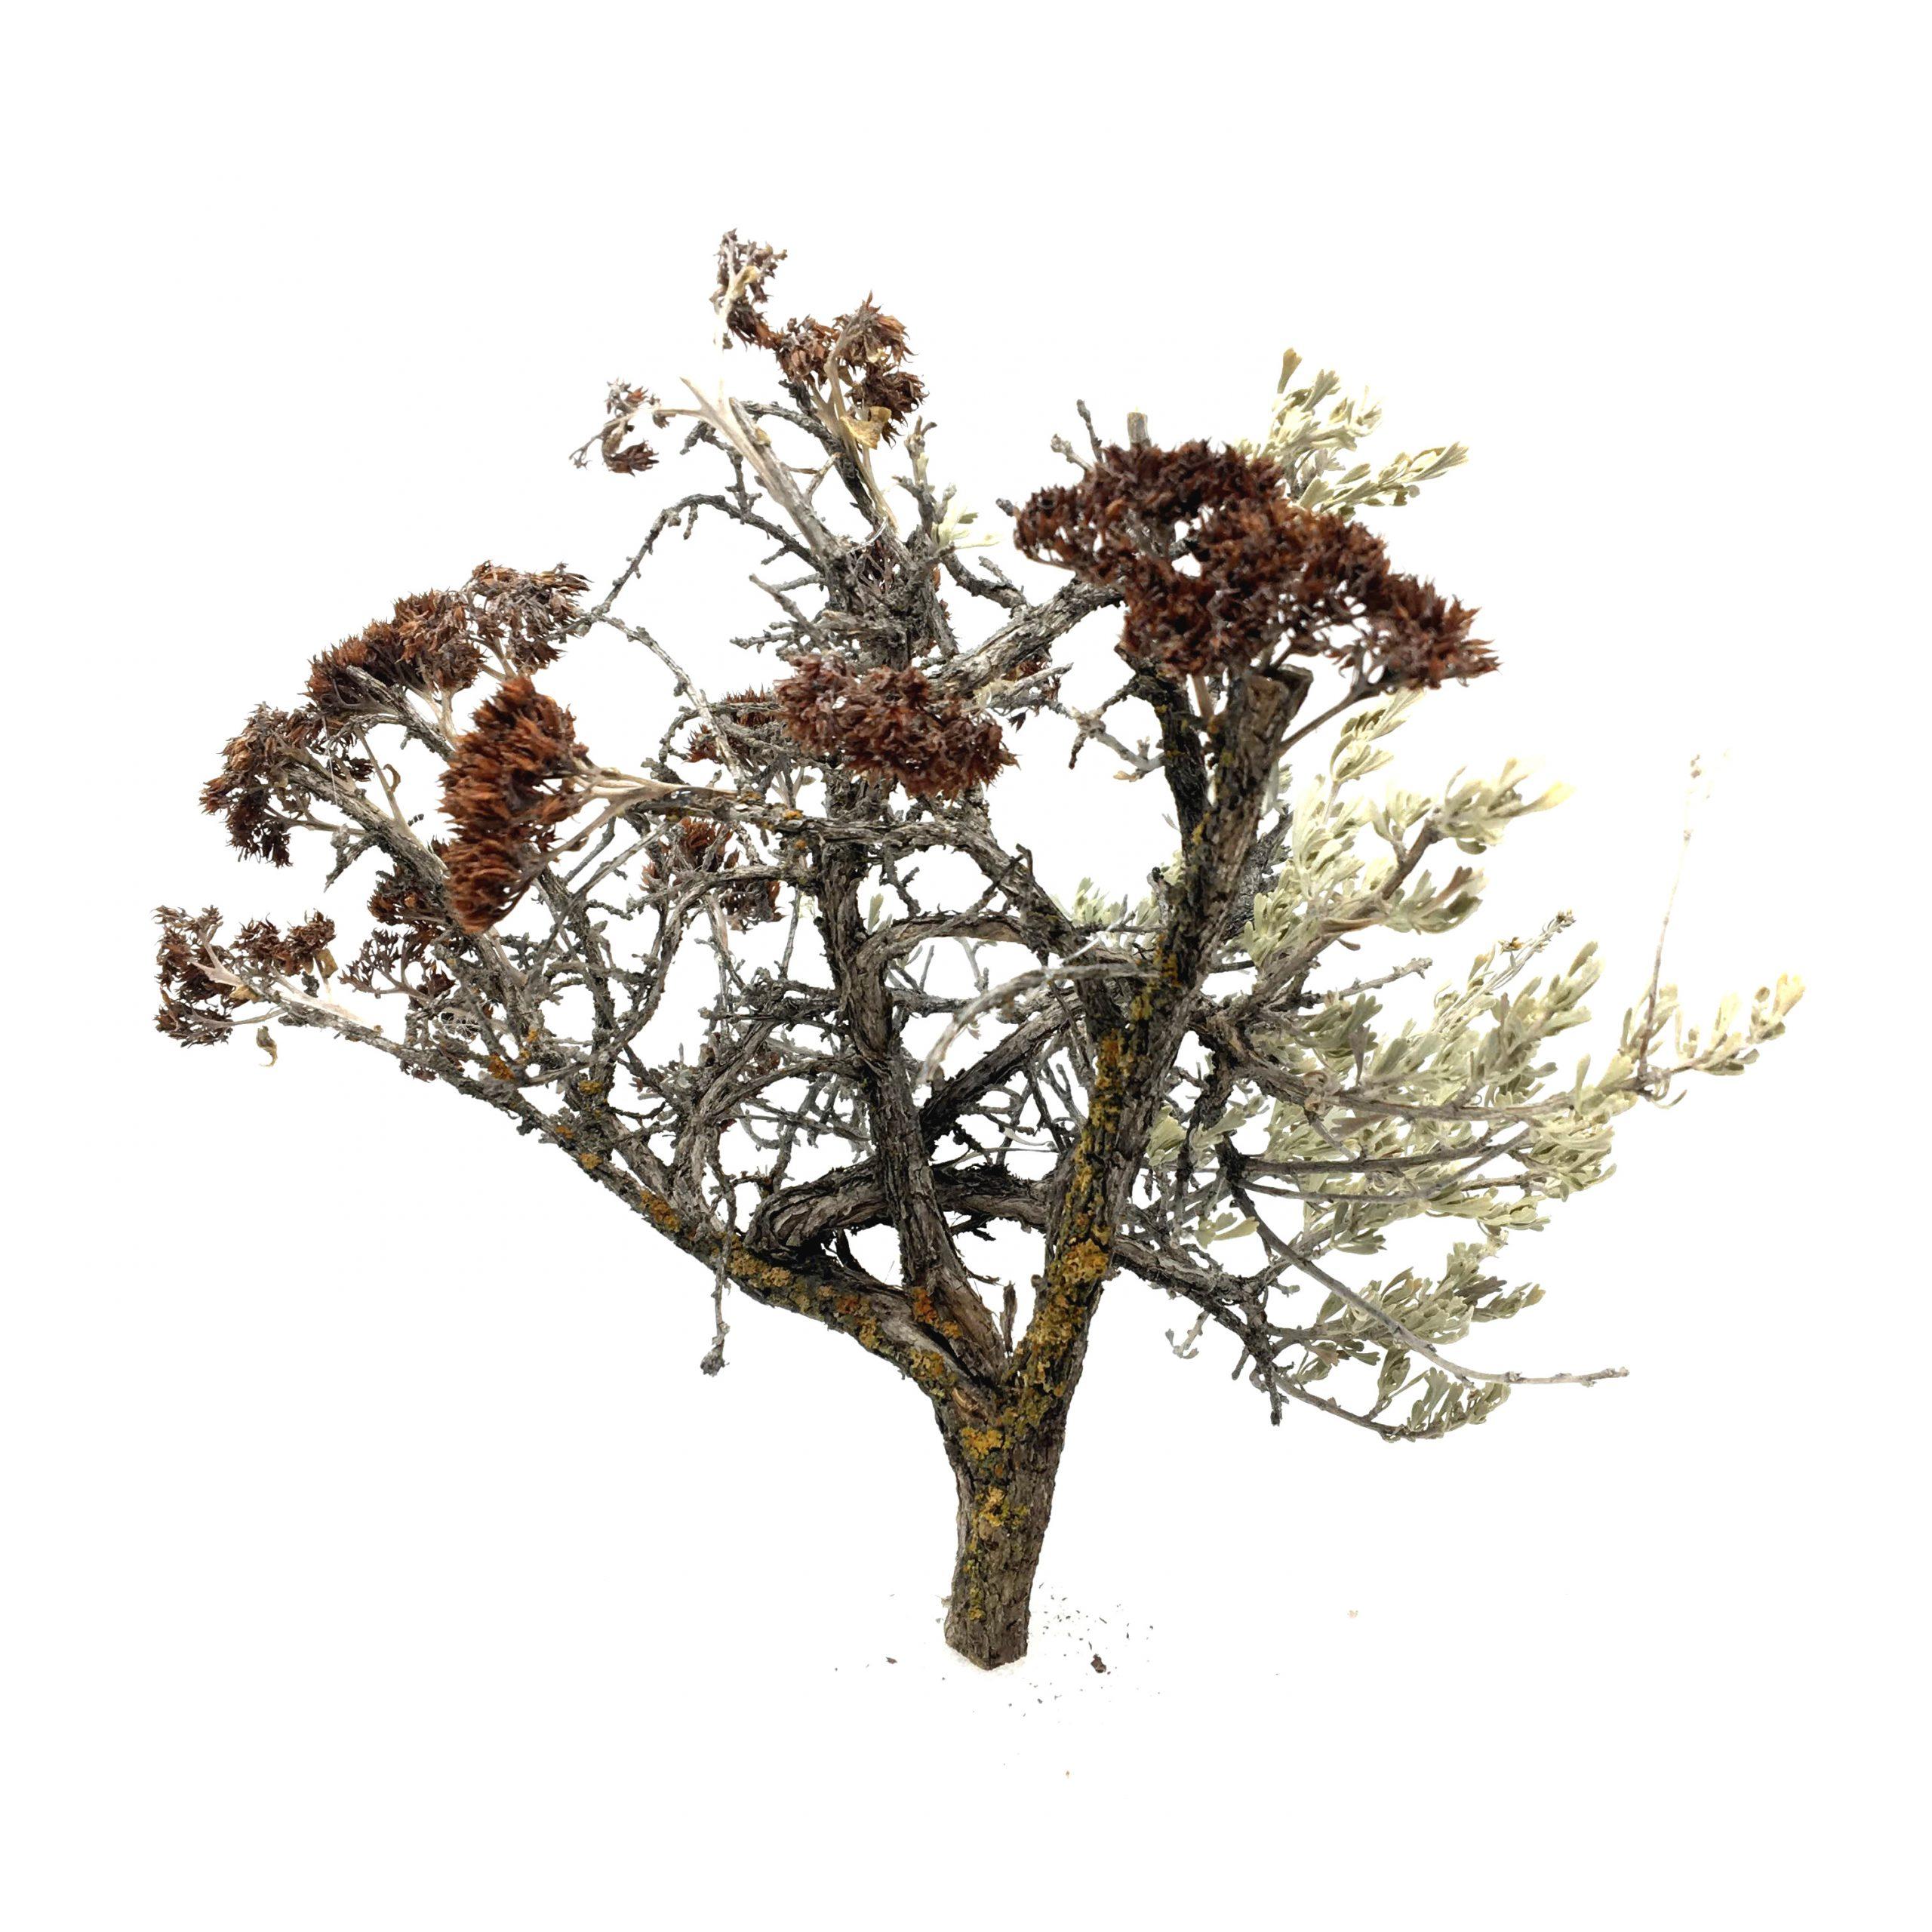 5 Inch Model Trees